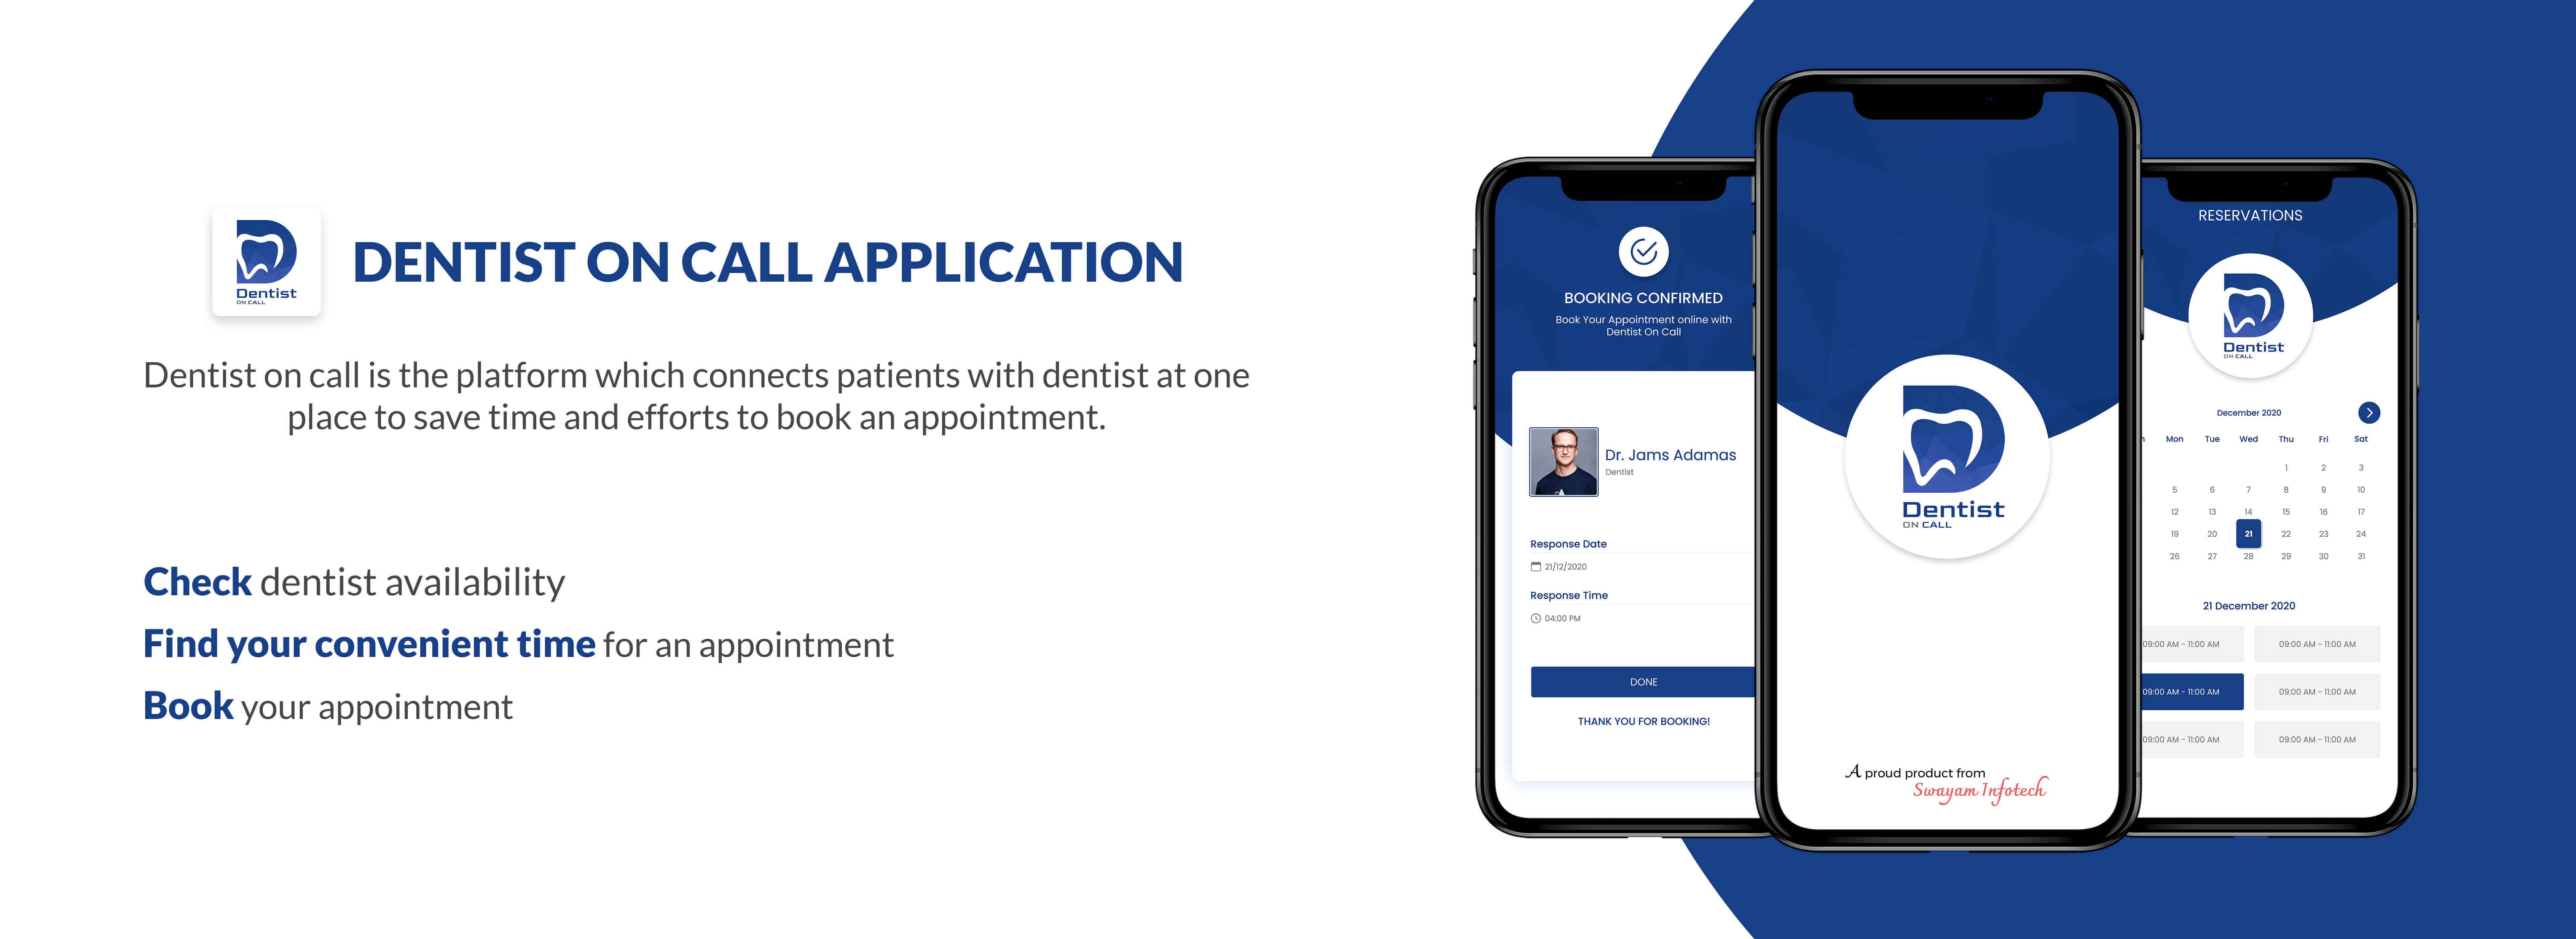 Dentist On Call Application